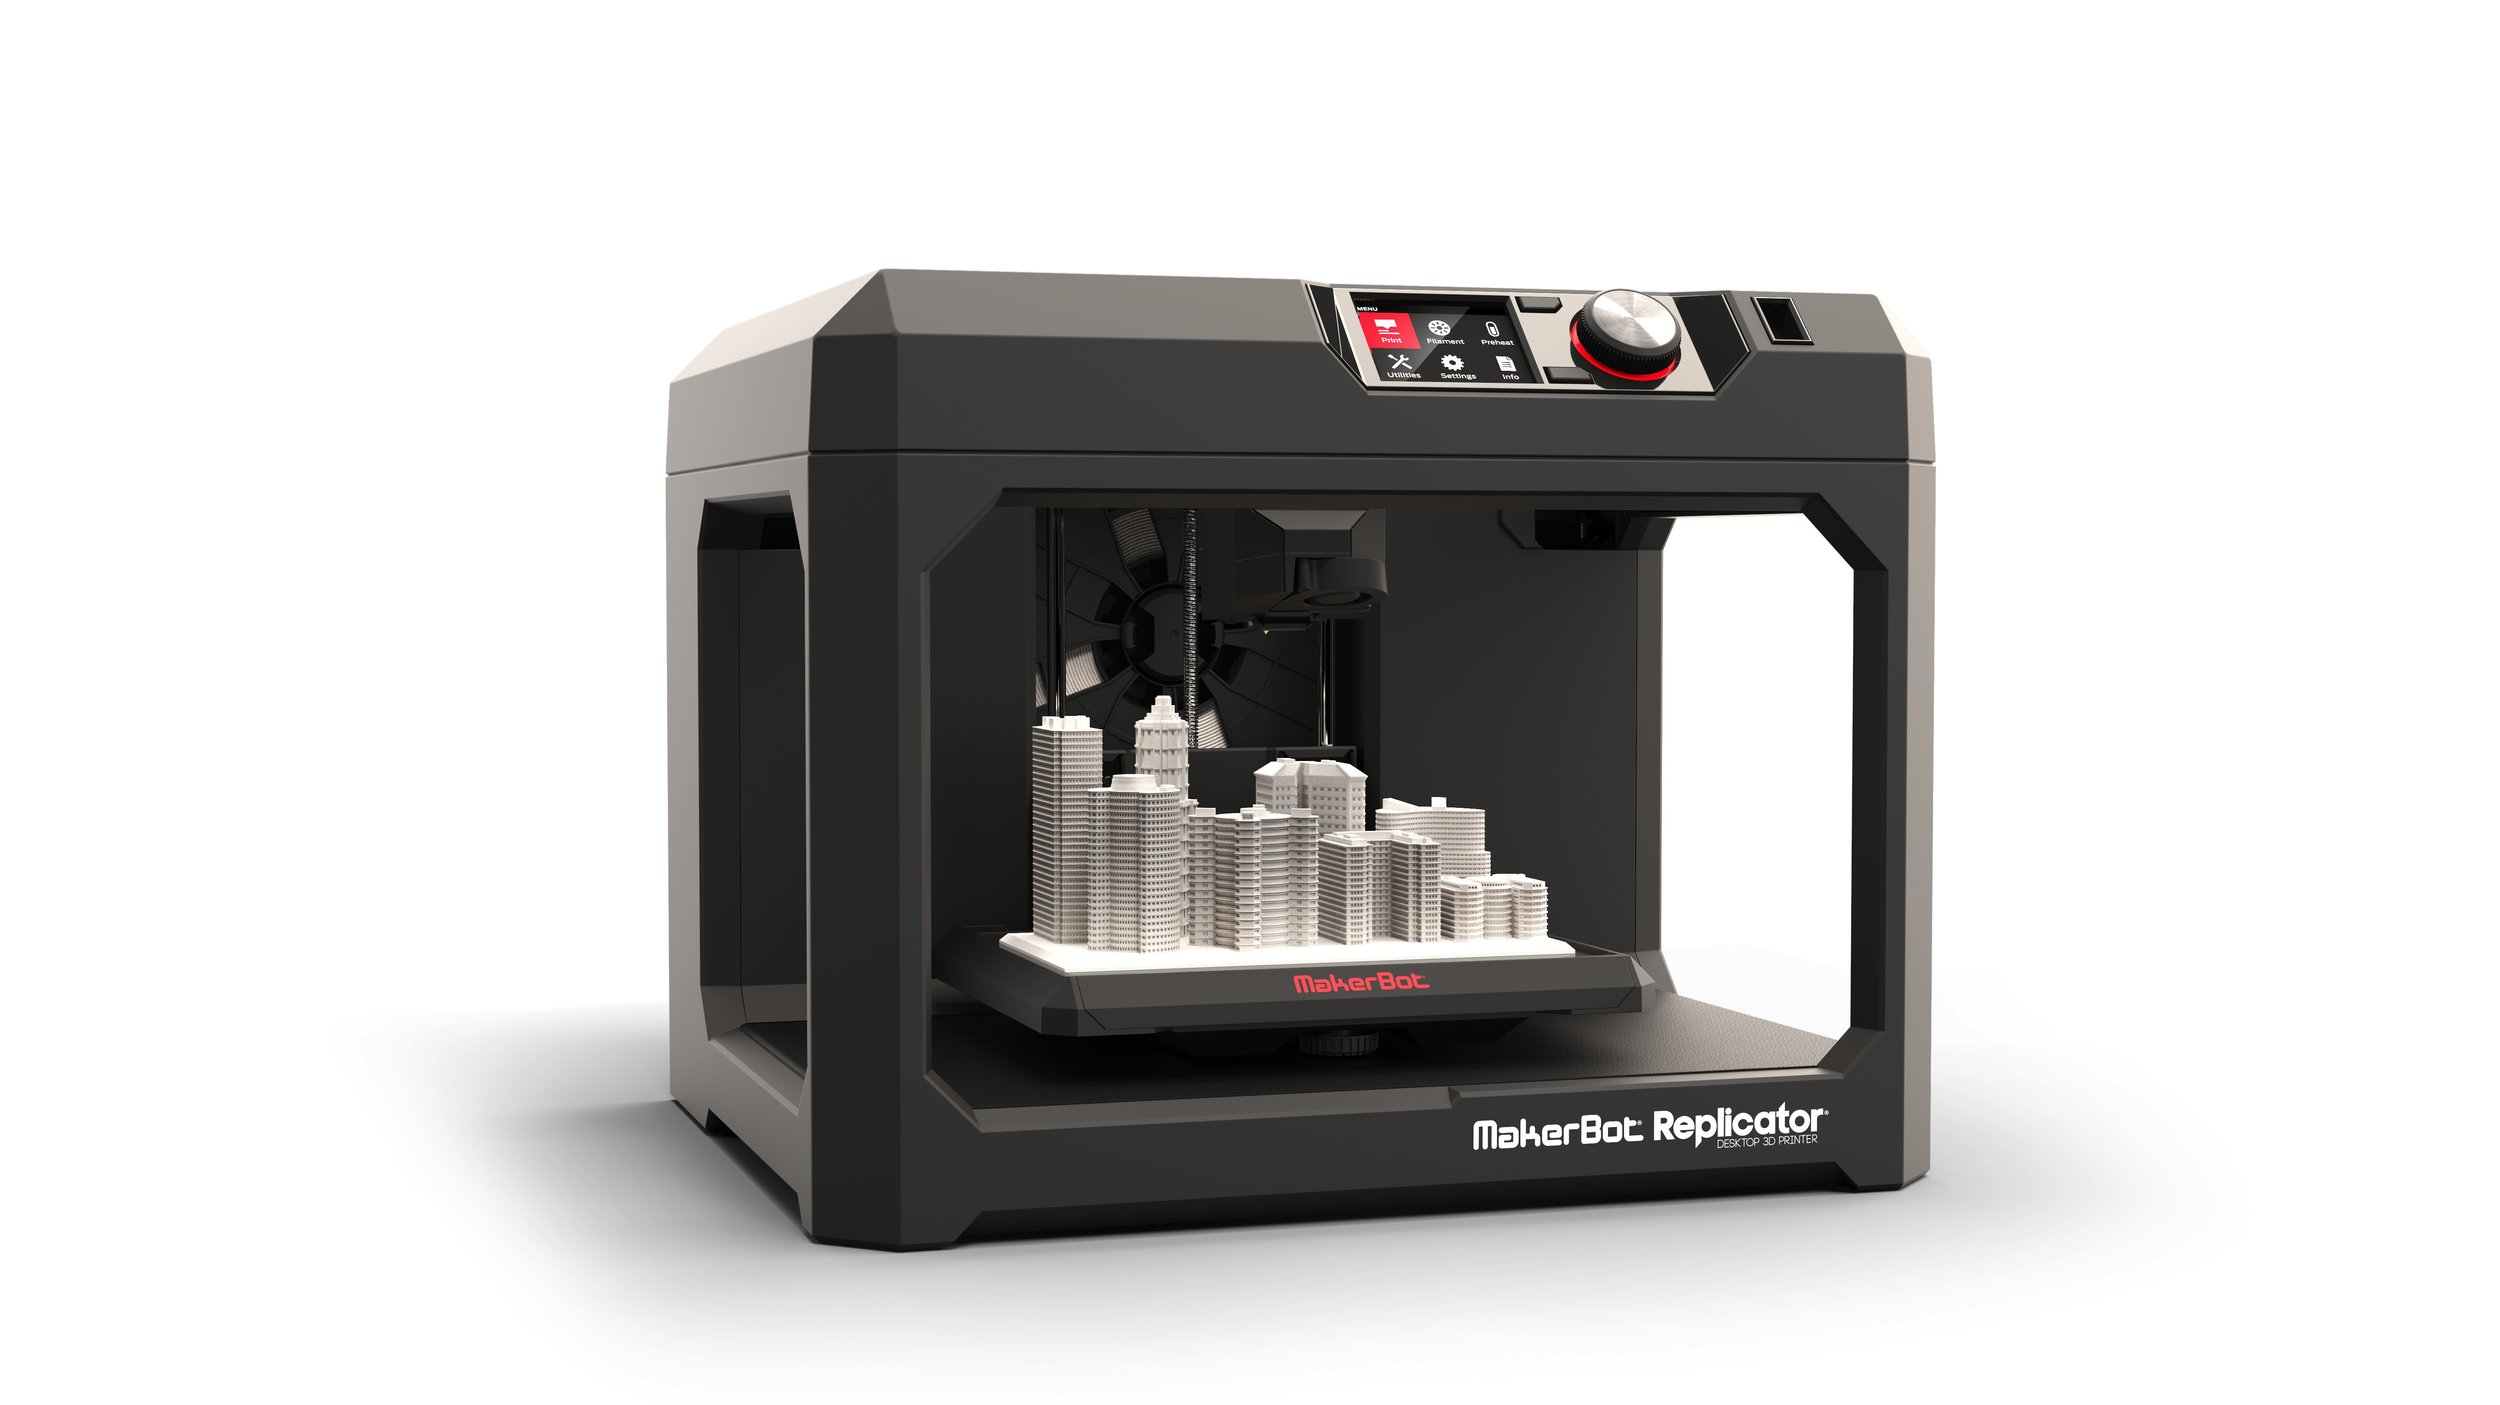 Makerbot Replicator + en Makerbot z18 (FDM printers)